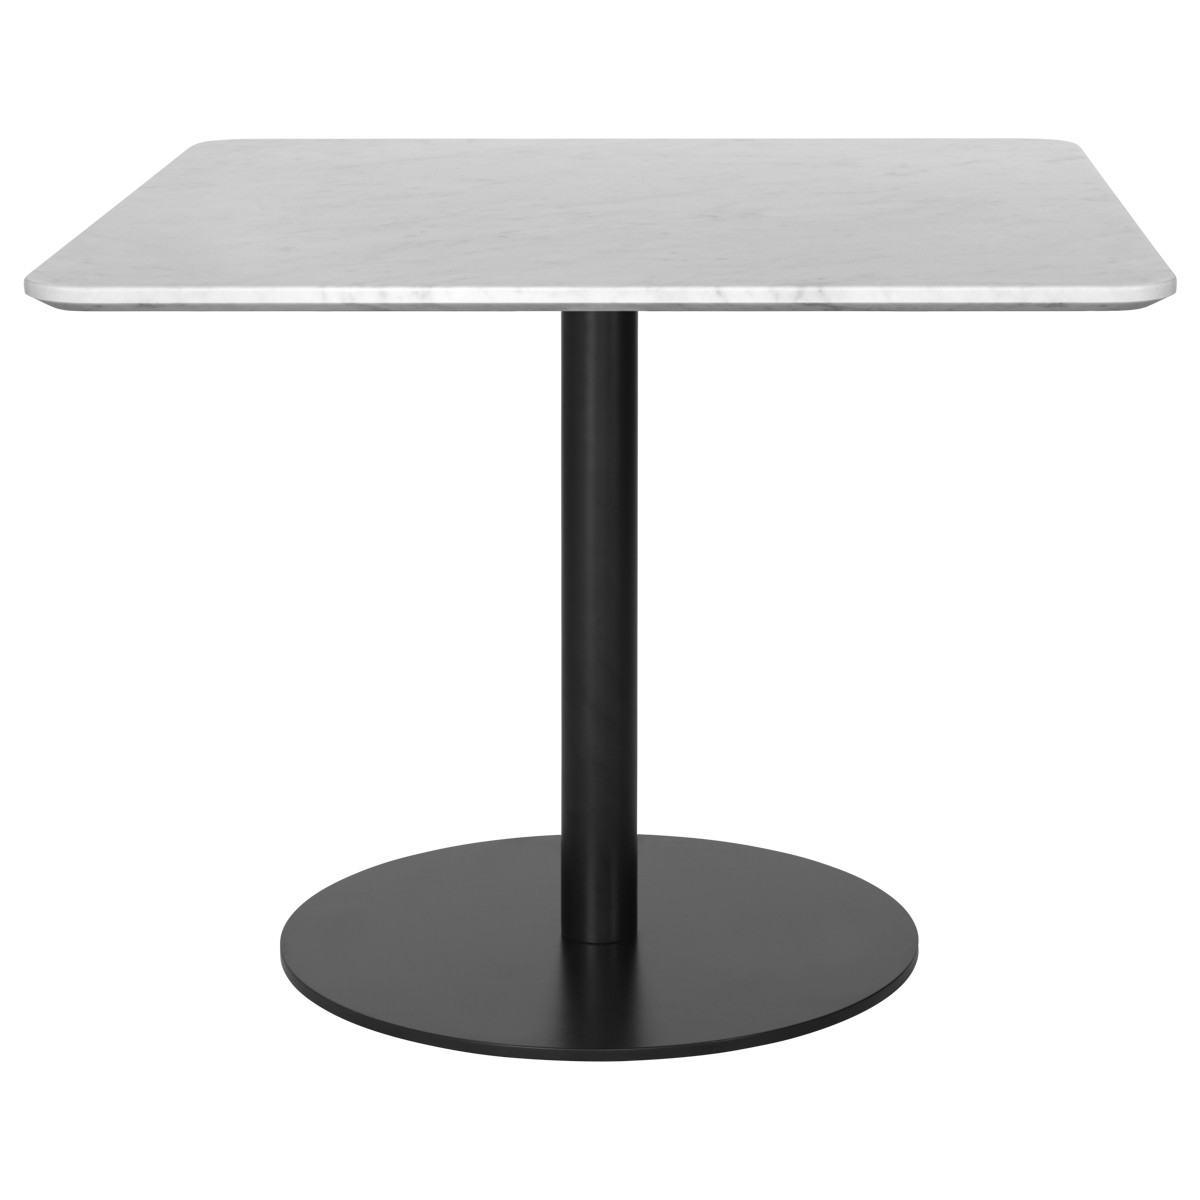 GUBI 1.0 Lounge Table - Square - 80x80